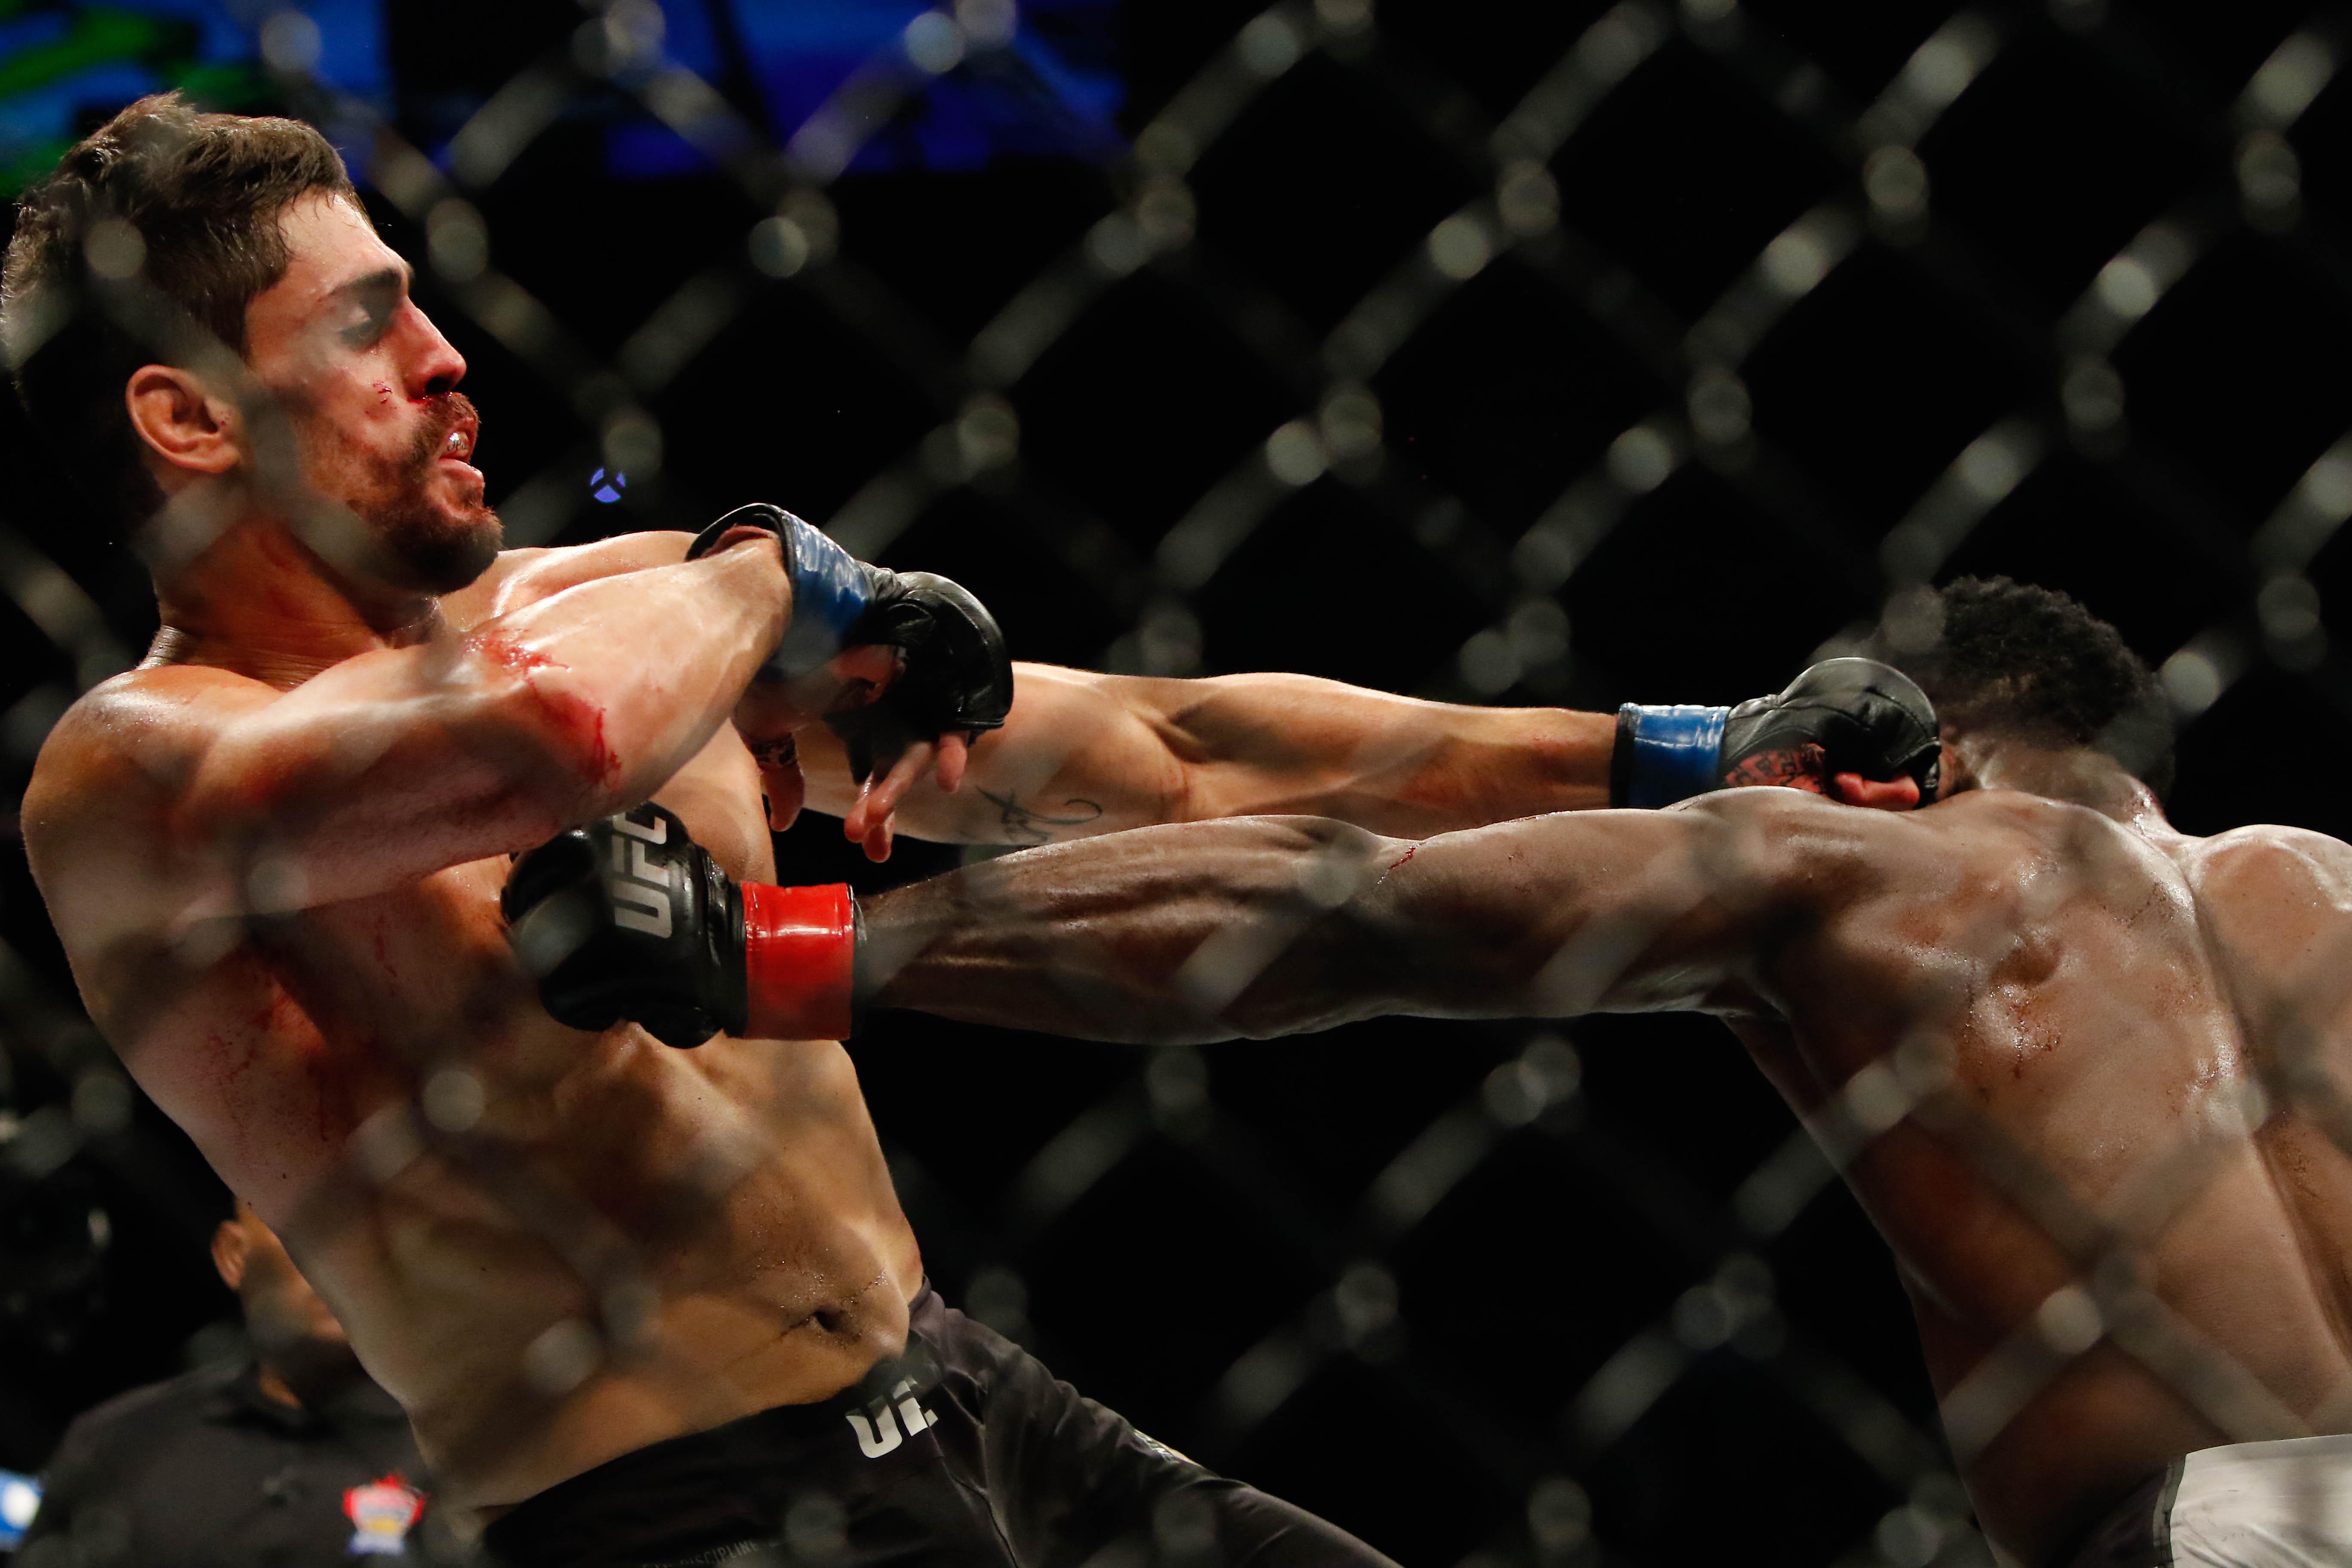 CT_bpp_UFC_hall_caradesapato-14092019-73